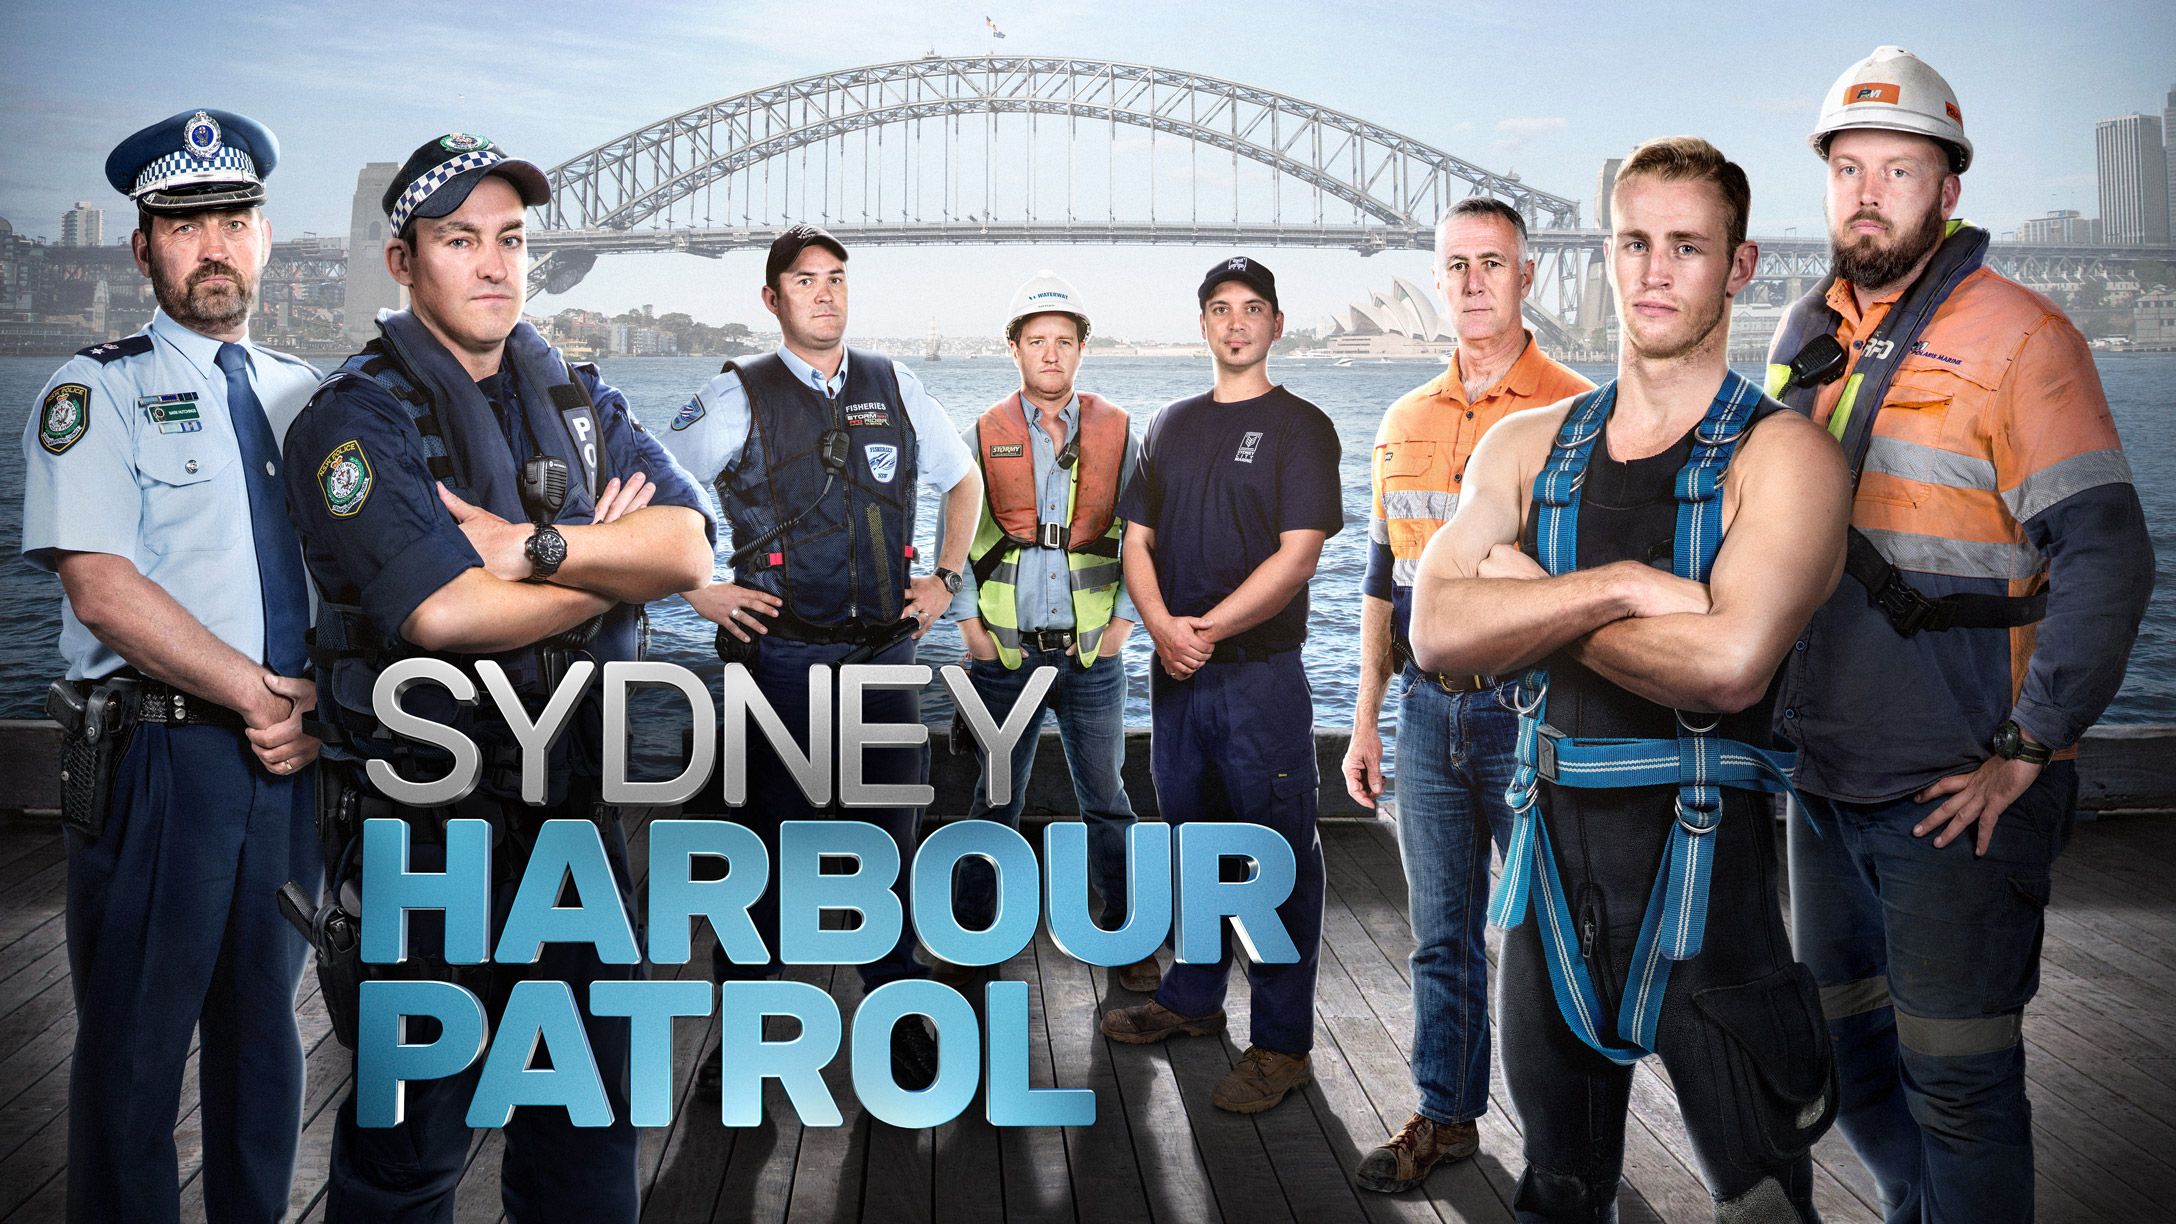 sydney-harbour-patrol-s1-key-art-8-cast-16x9-uk-logo-v5i